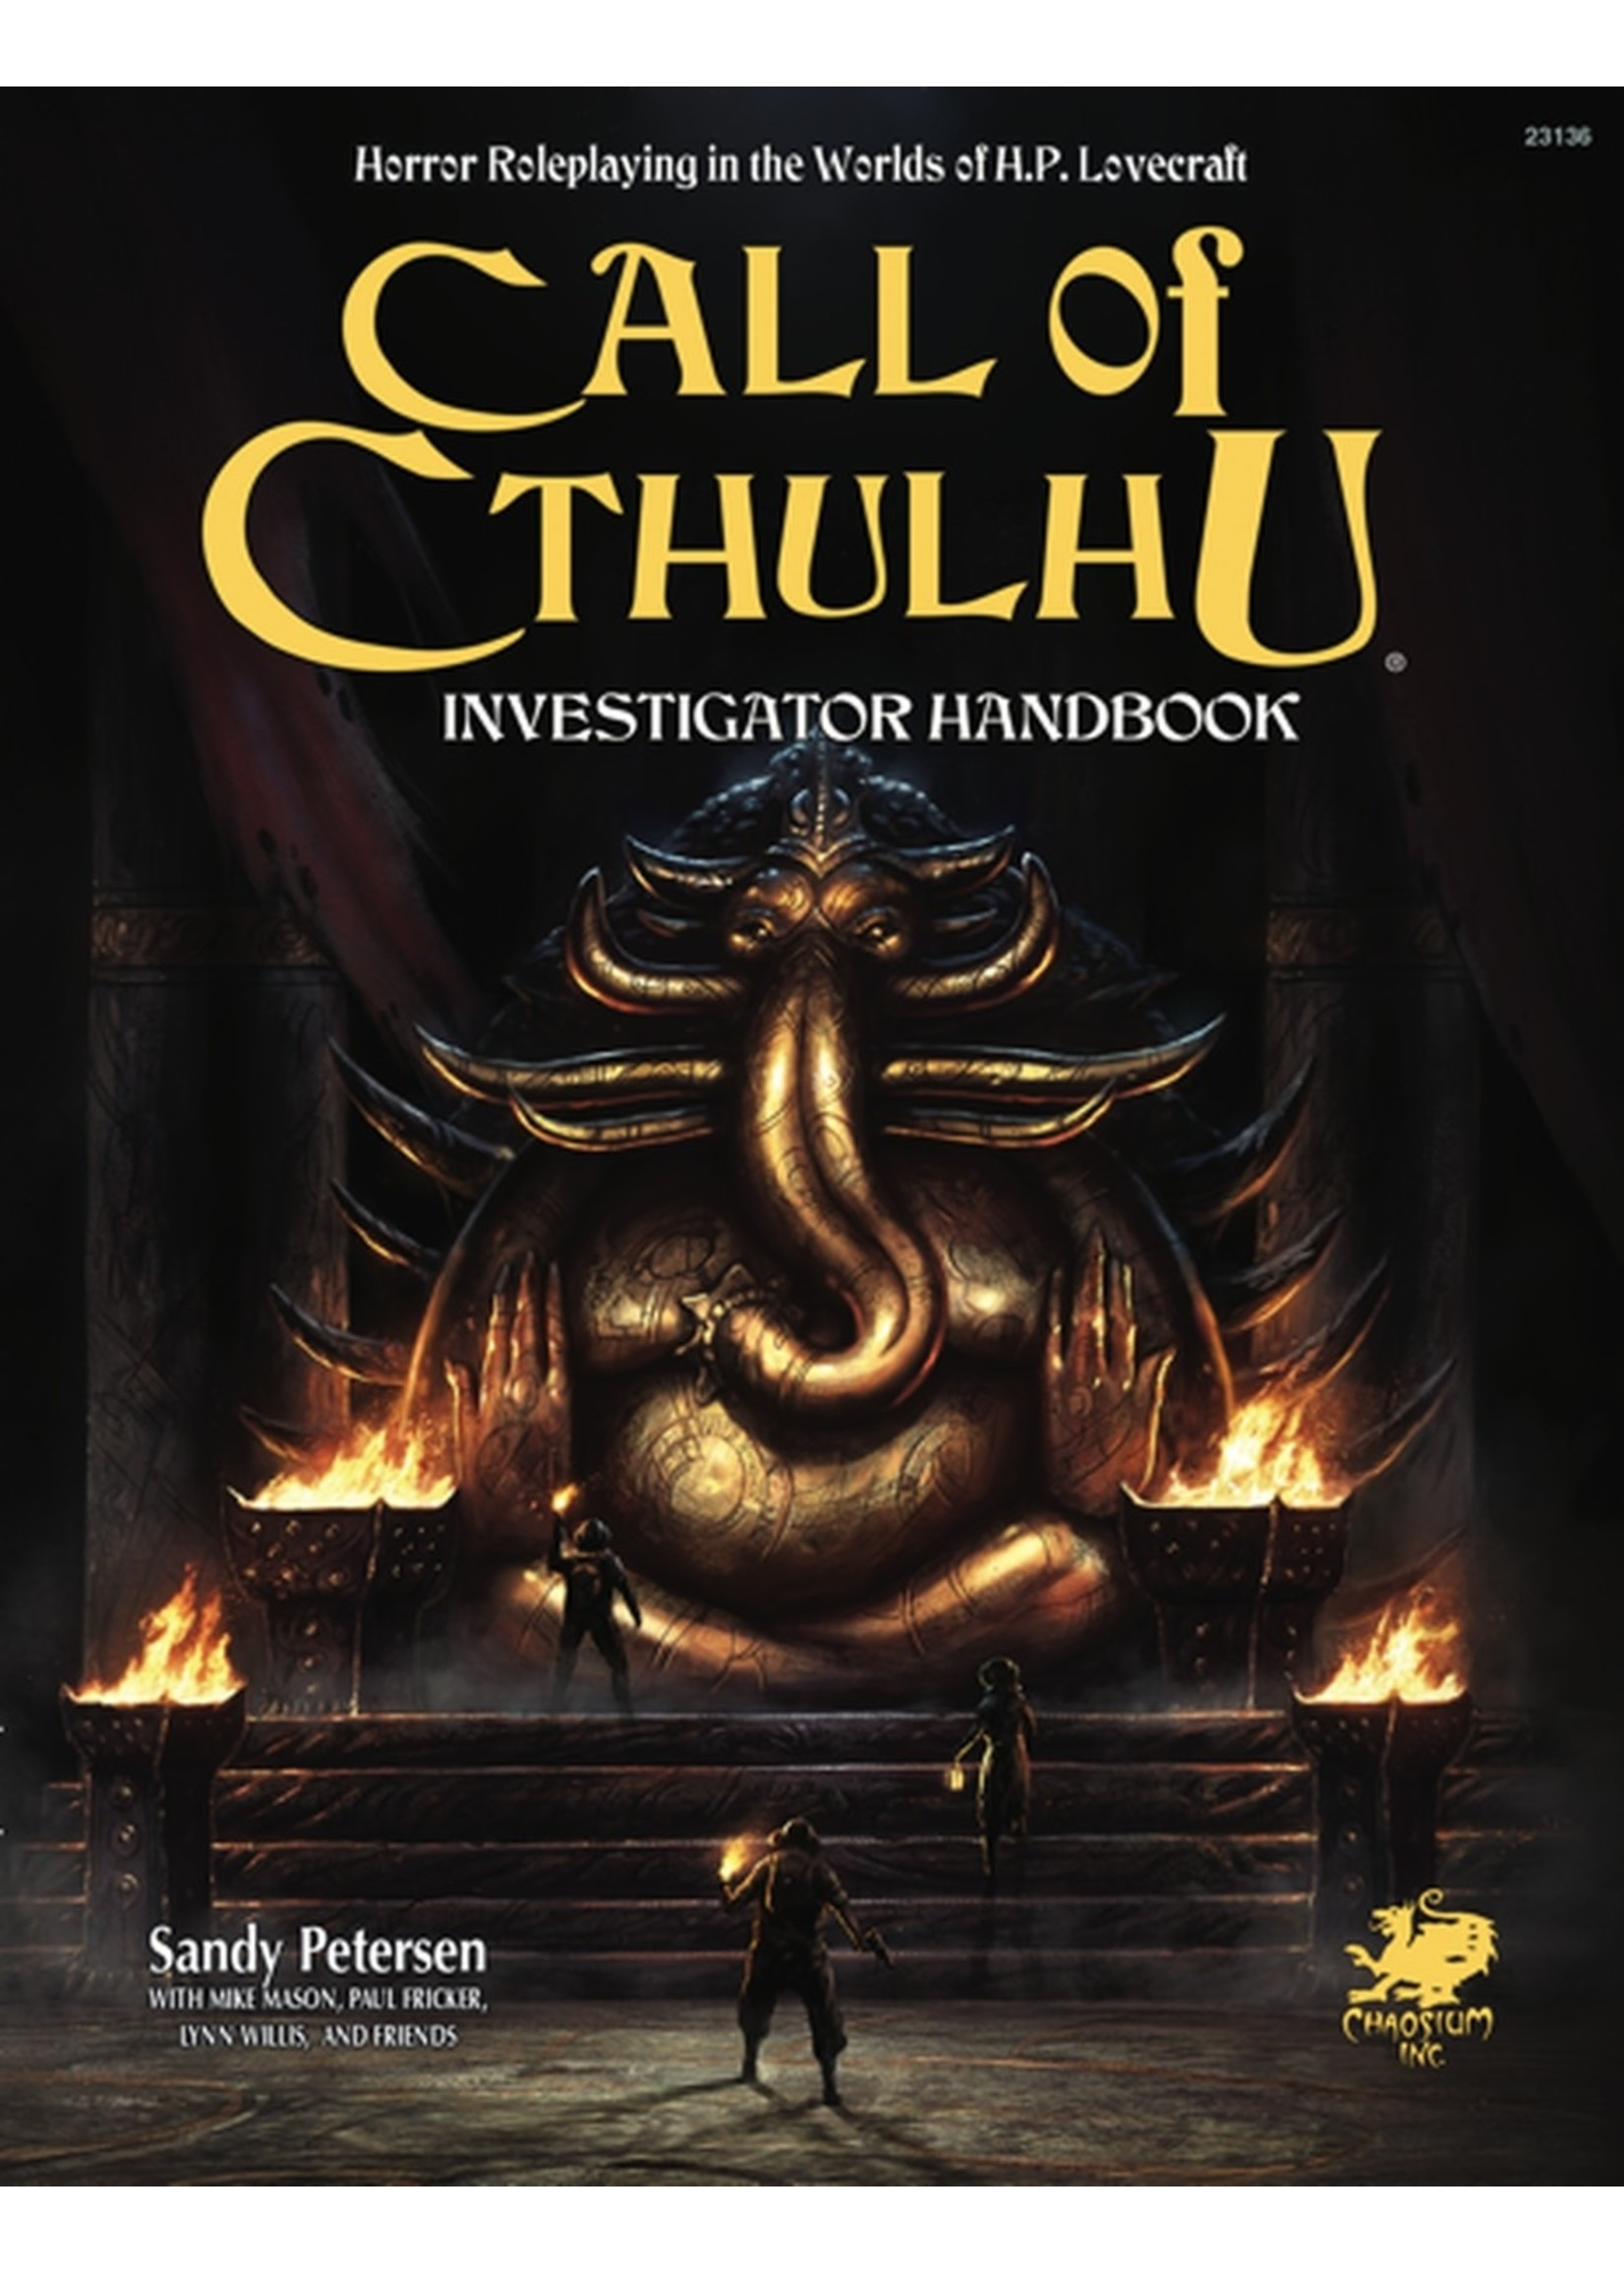 Call of Cthulhu: 7th Edition Investigator Handbook